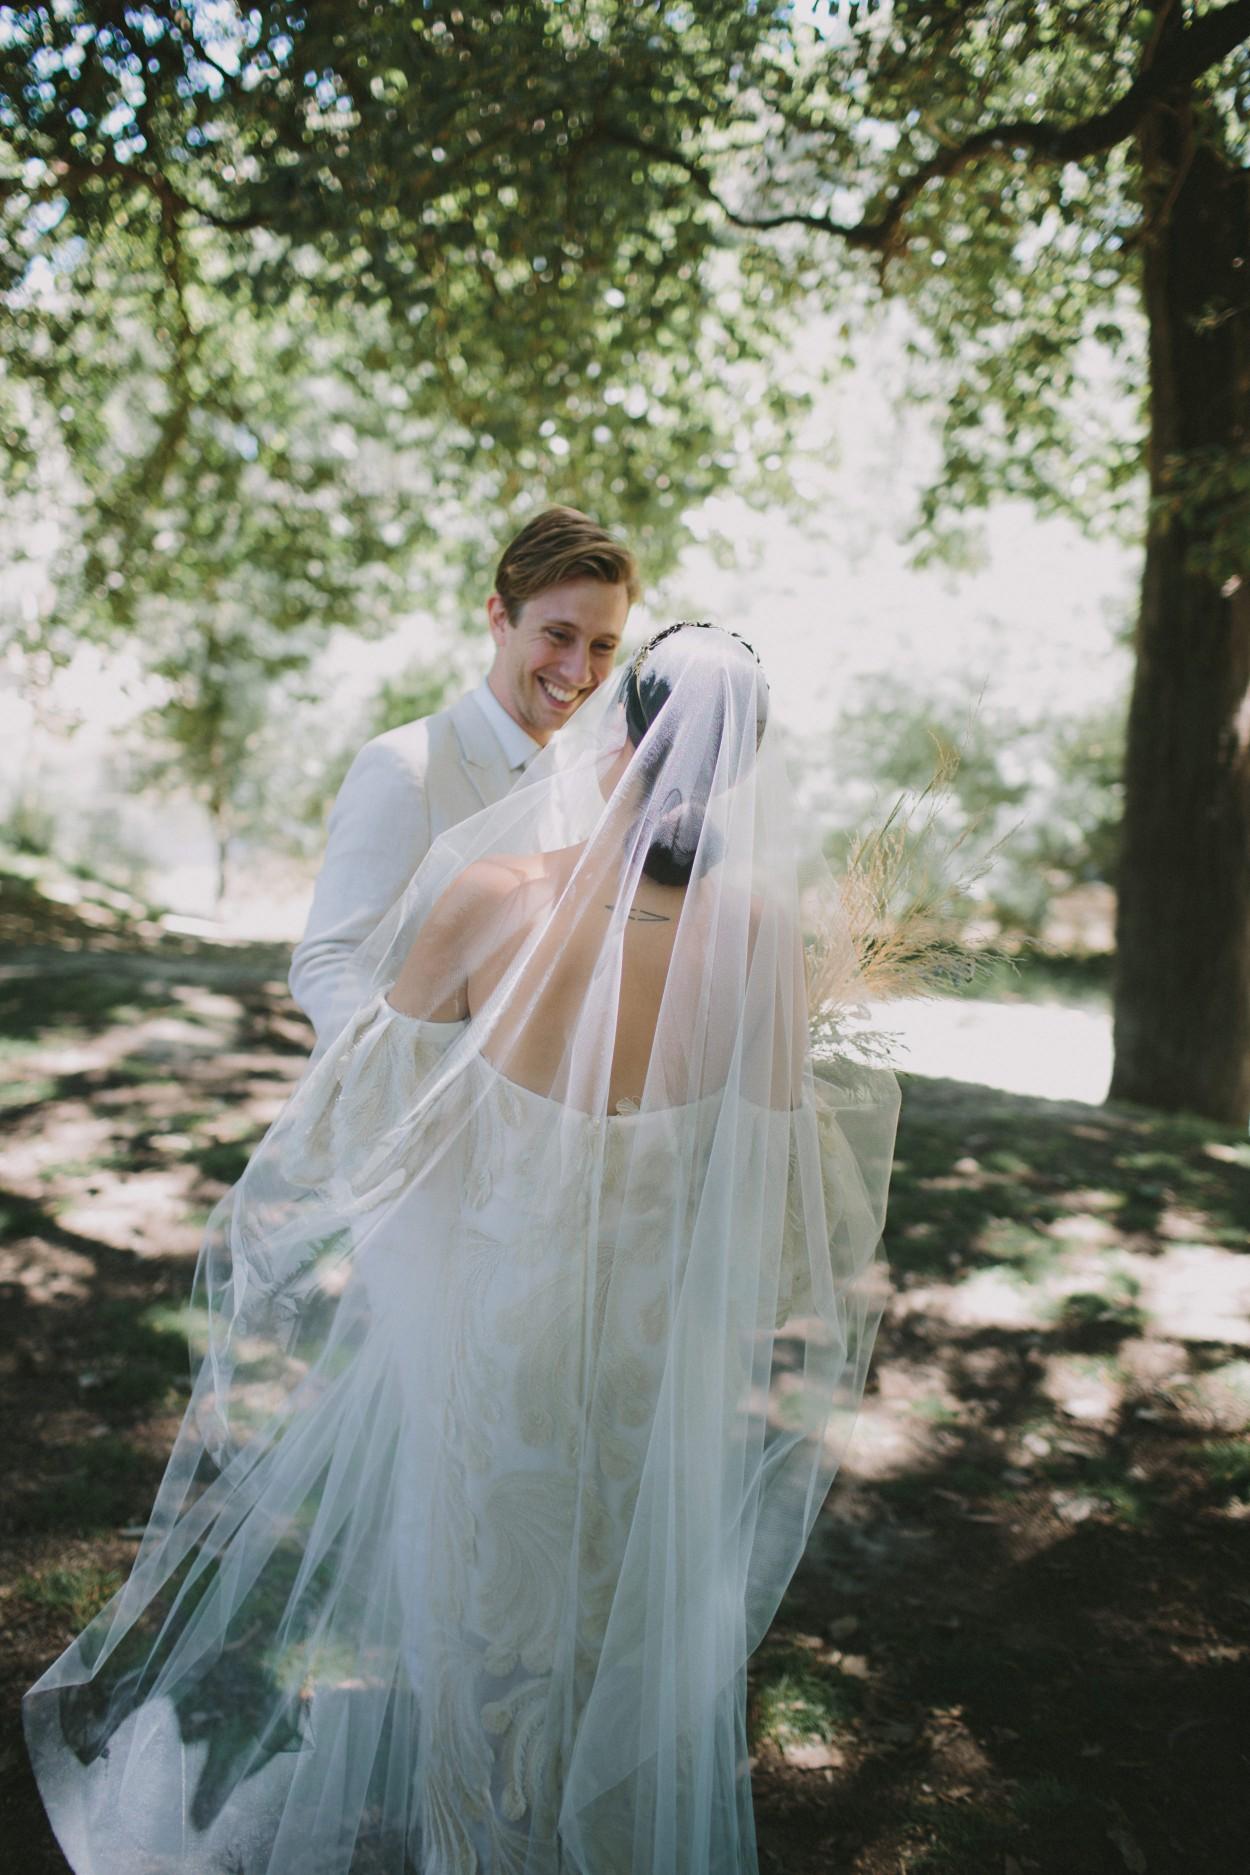 I-Got-You-Babe-Weddings-Heide-Museum-of-Modern-Art-Elopement-Susie-Nathan011.jpg